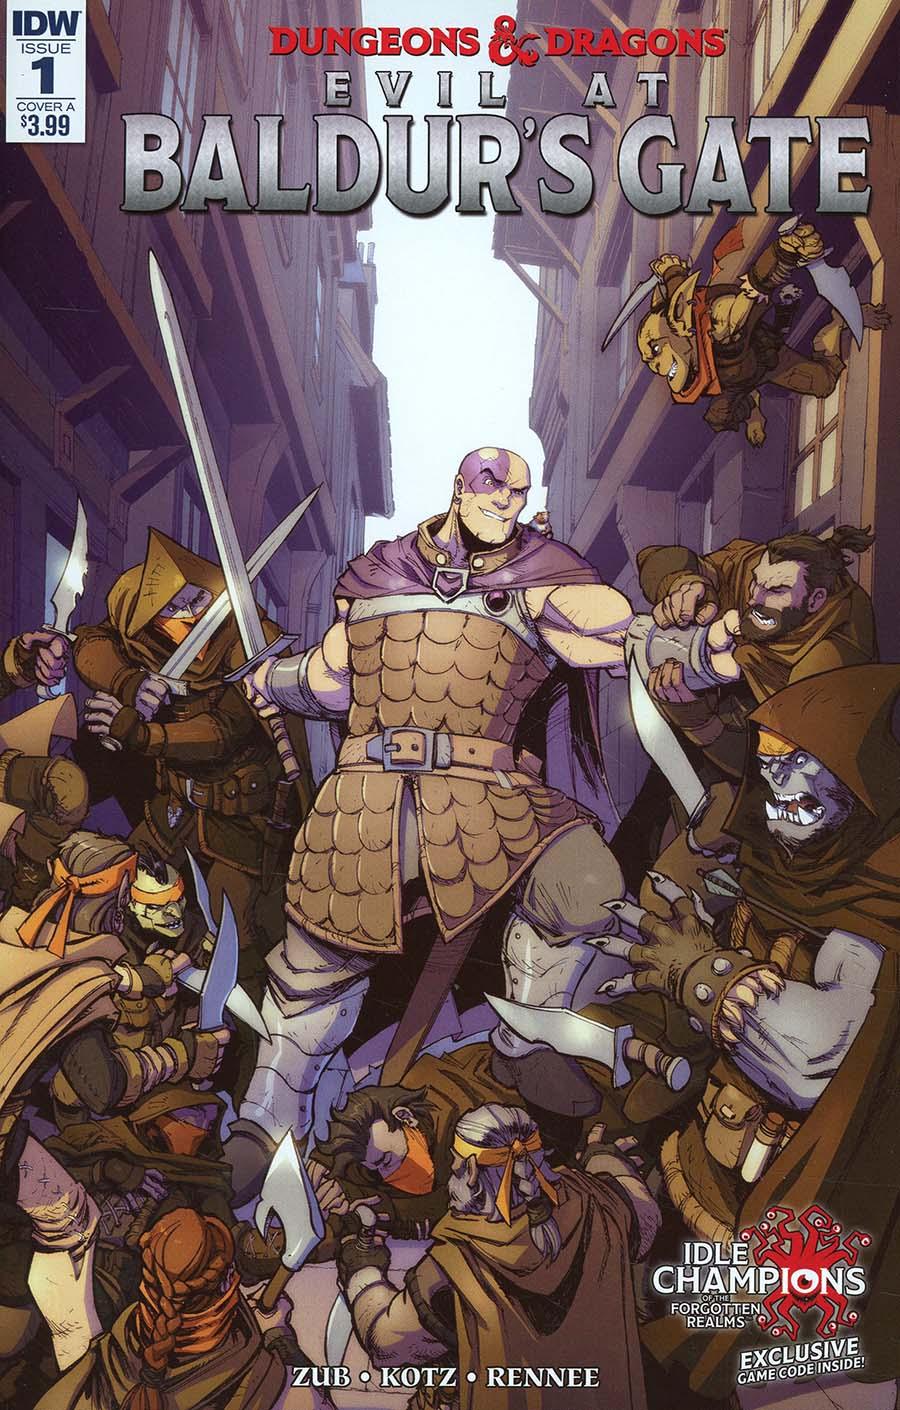 Dungeons & Dragons Evil At Baldurs Gate #1 Cover A Regular Max Dunbar Cover